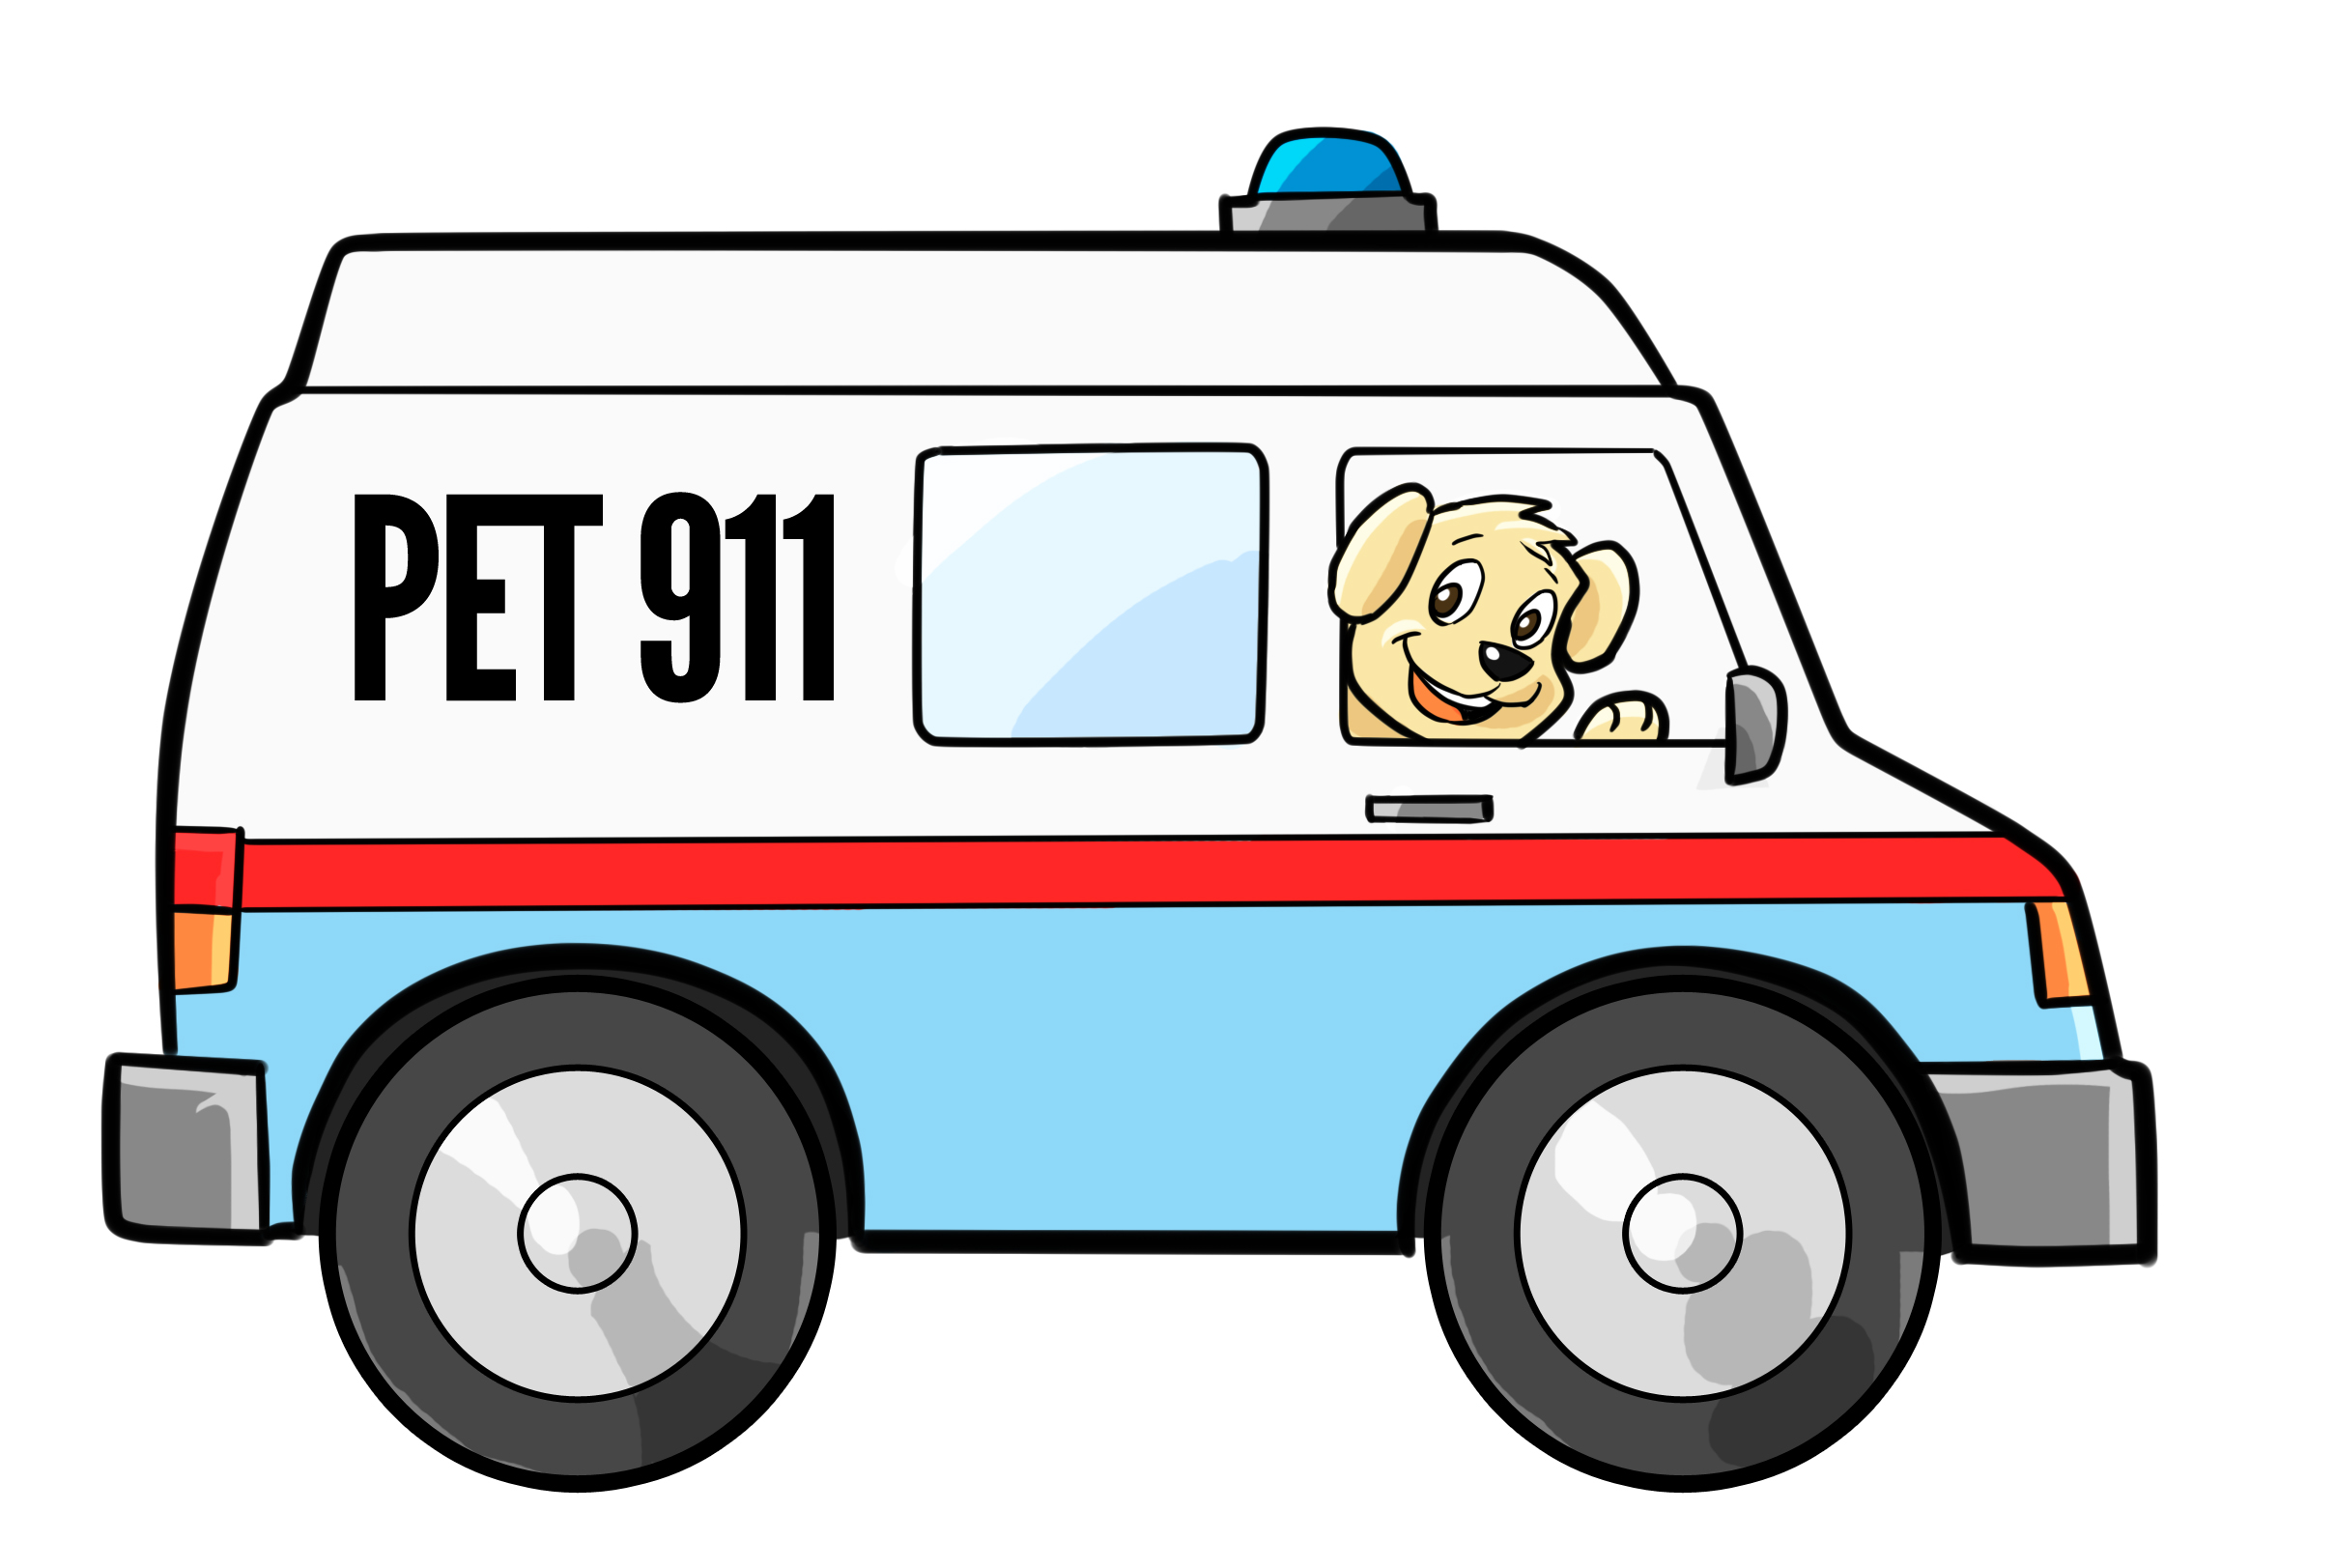 Cartoon ambulance clipart png free stock Free Cartoon Ambulance Pictures, Download Free Clip Art, Free Clip ... png free stock